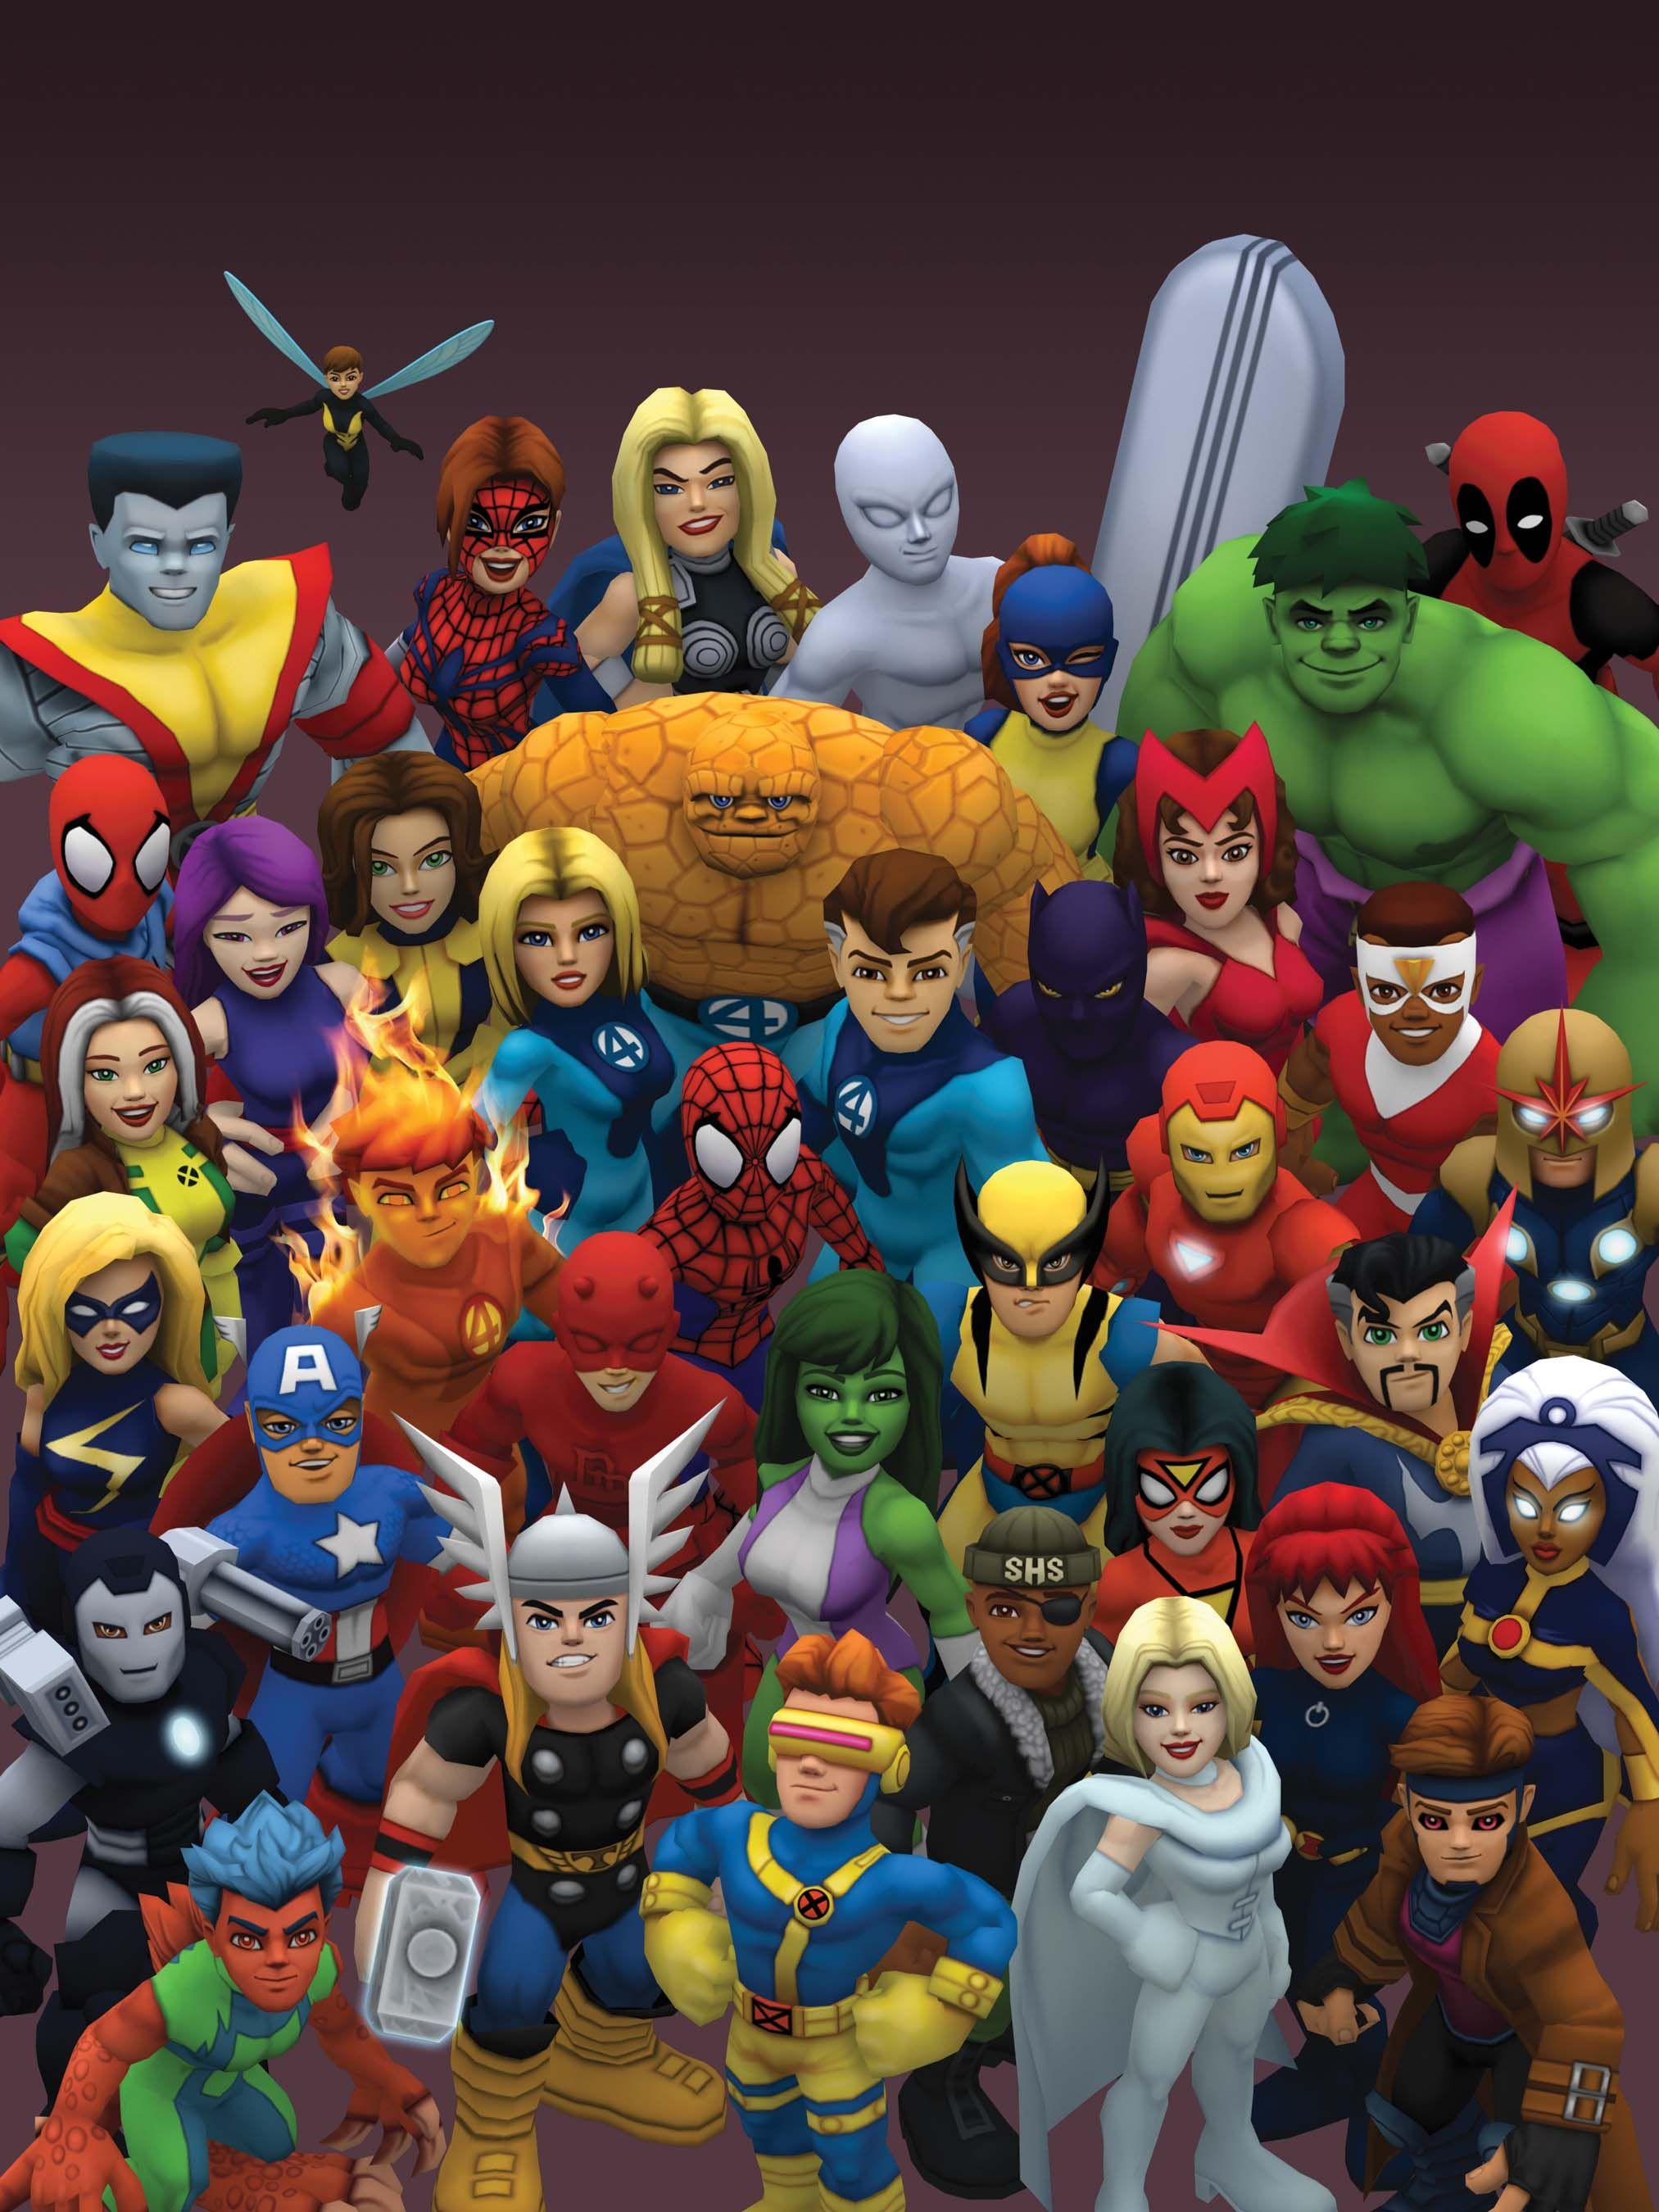 Marvel In July 2011 Marvel Universe Marvel superheroes